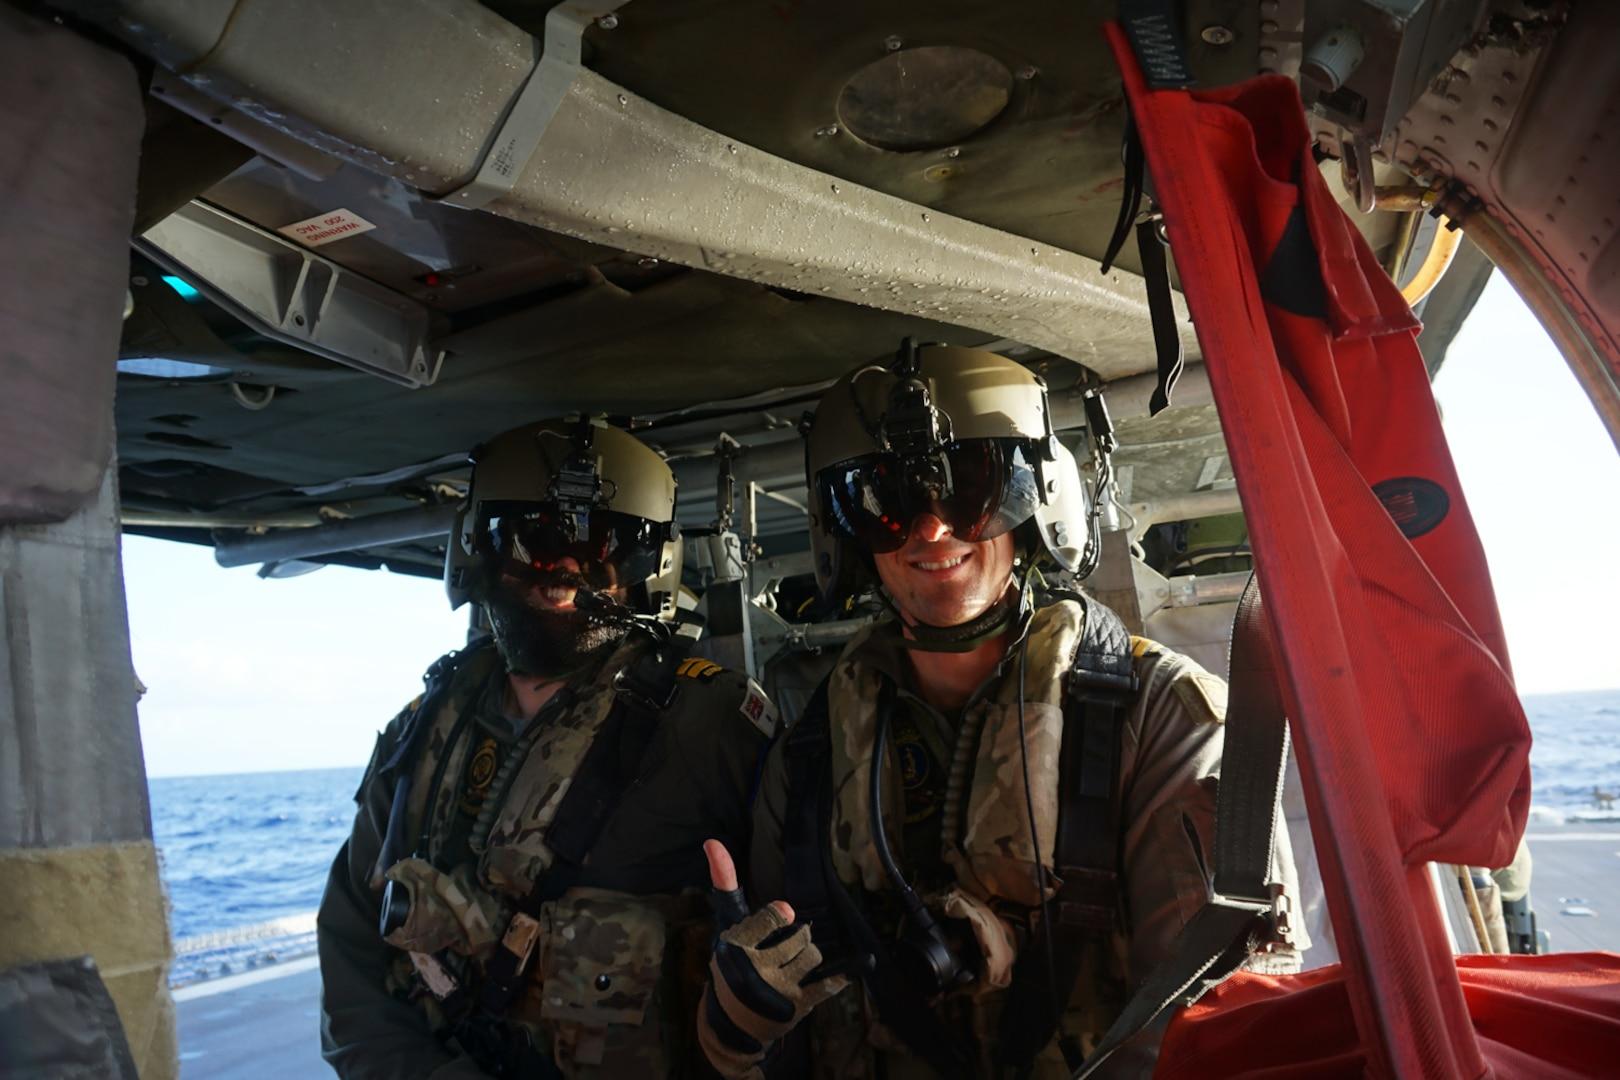 U.S., Australian Navies Conduct Helicopter Deck Landings in Philippine Sea